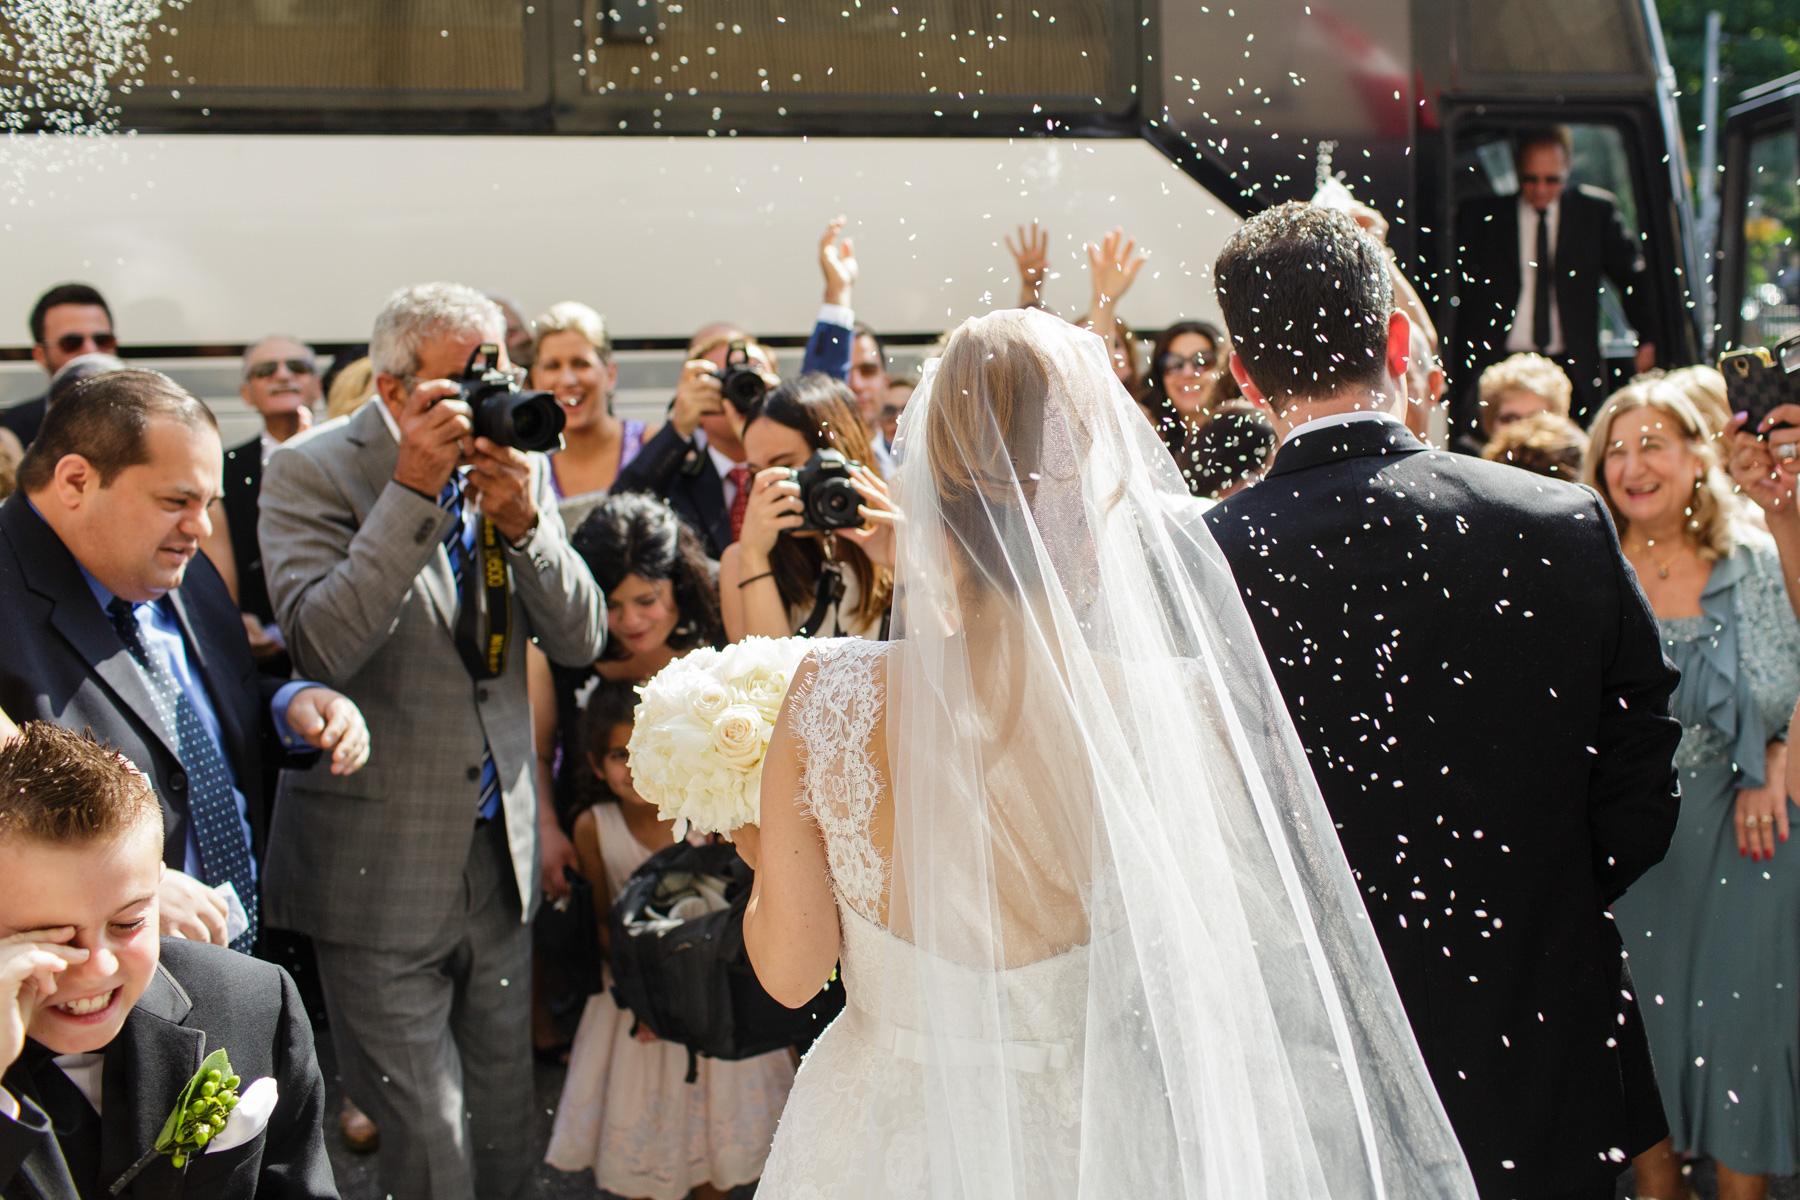 joeewong-chdi-toronto-liberty-grand-wedding-224